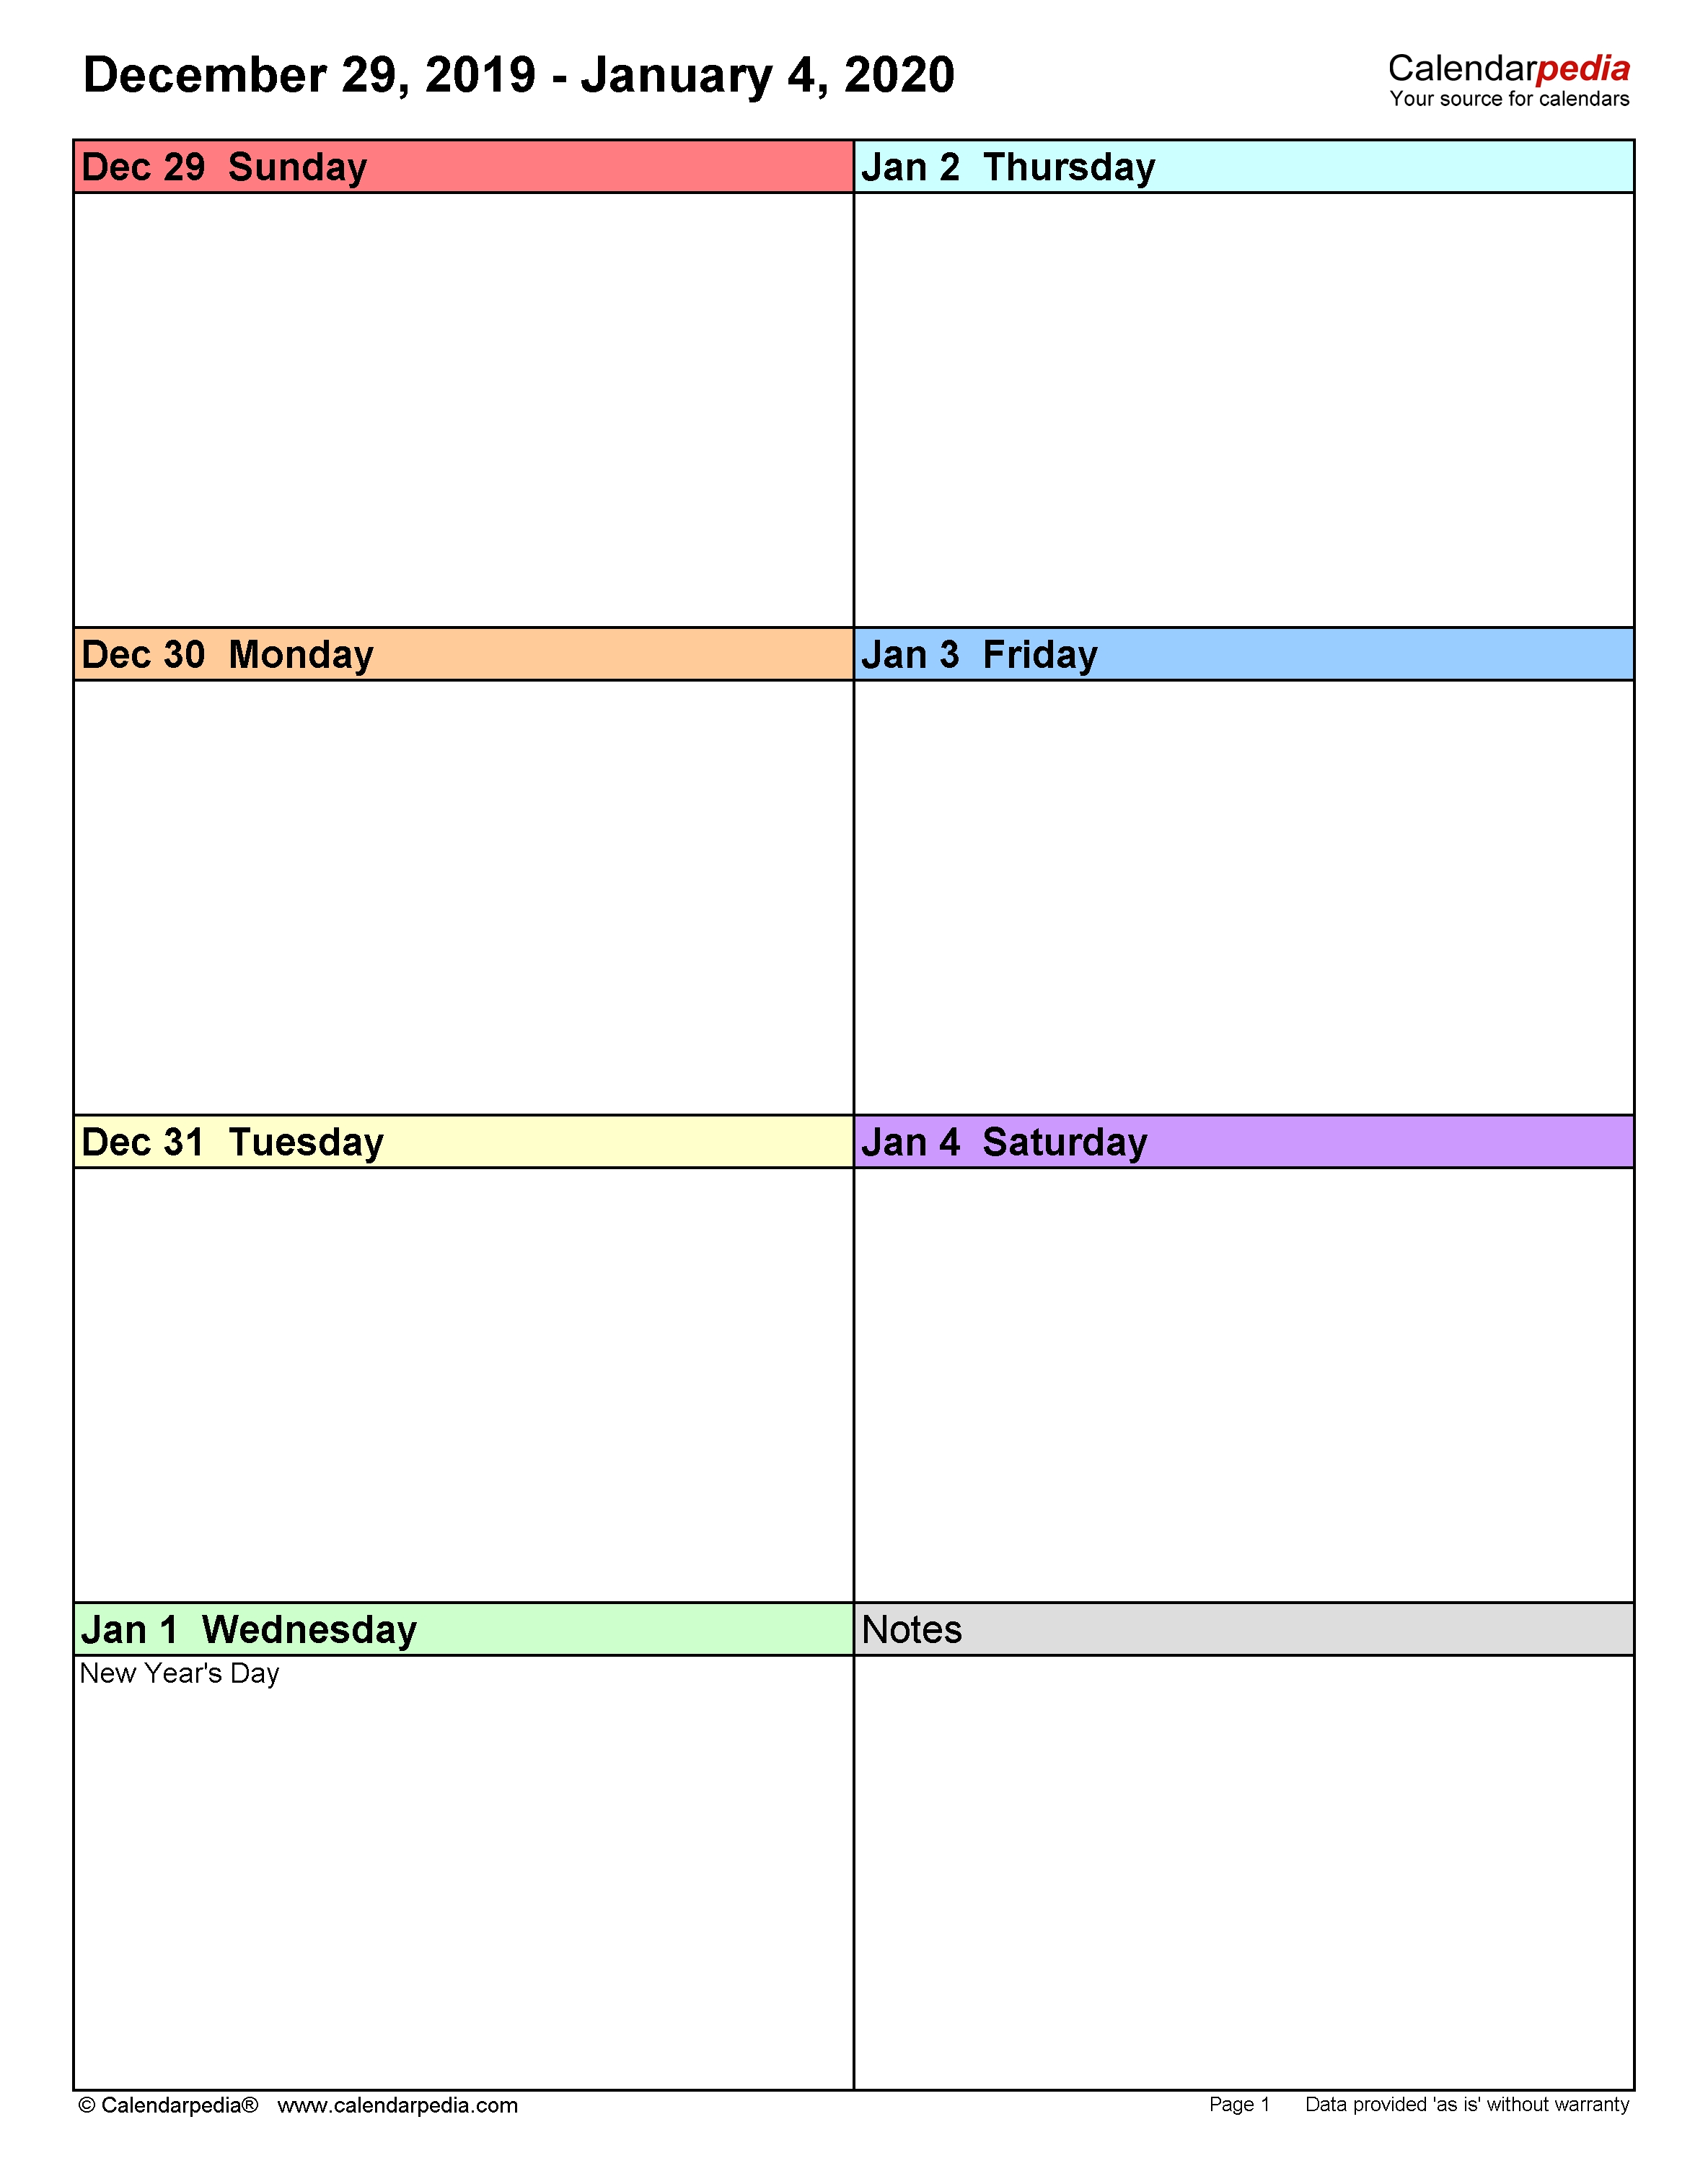 Weekly Calendars 2020 For Word - 12 Free Printable Templates in 1 Week Blank Calendar Free Printable